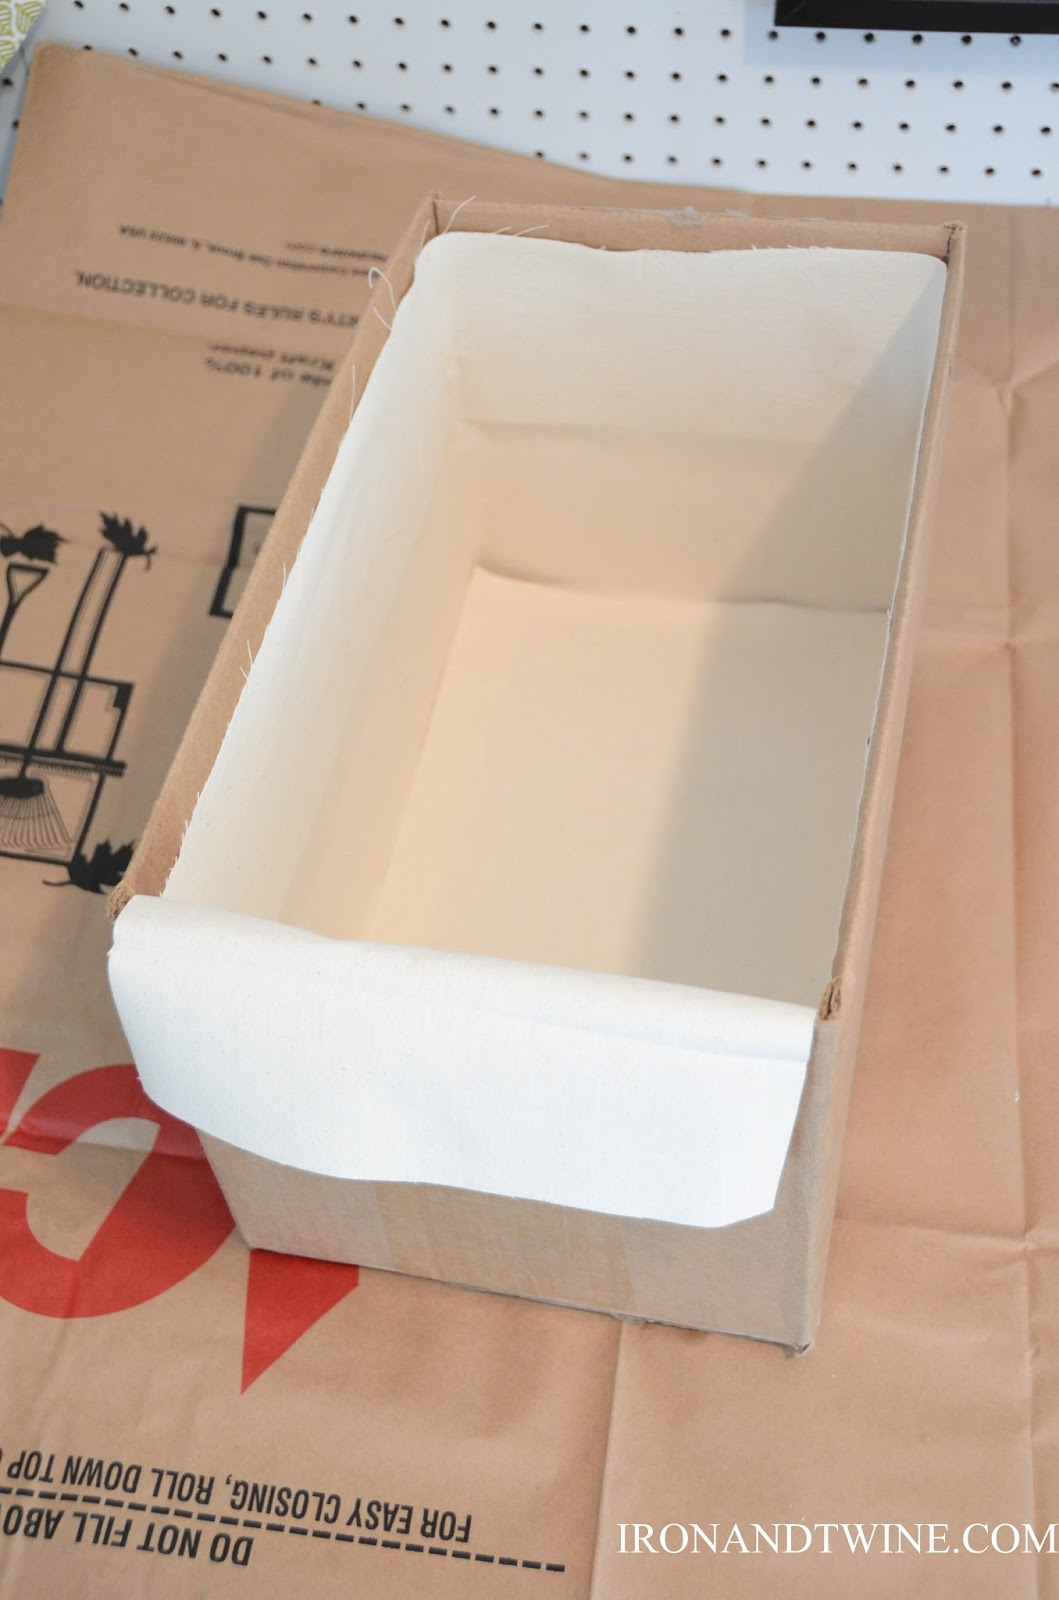 DIY+Belt+Handled+Box,+DIY+fabric+covered+box,+Iron+and+Twine+(20).jpg